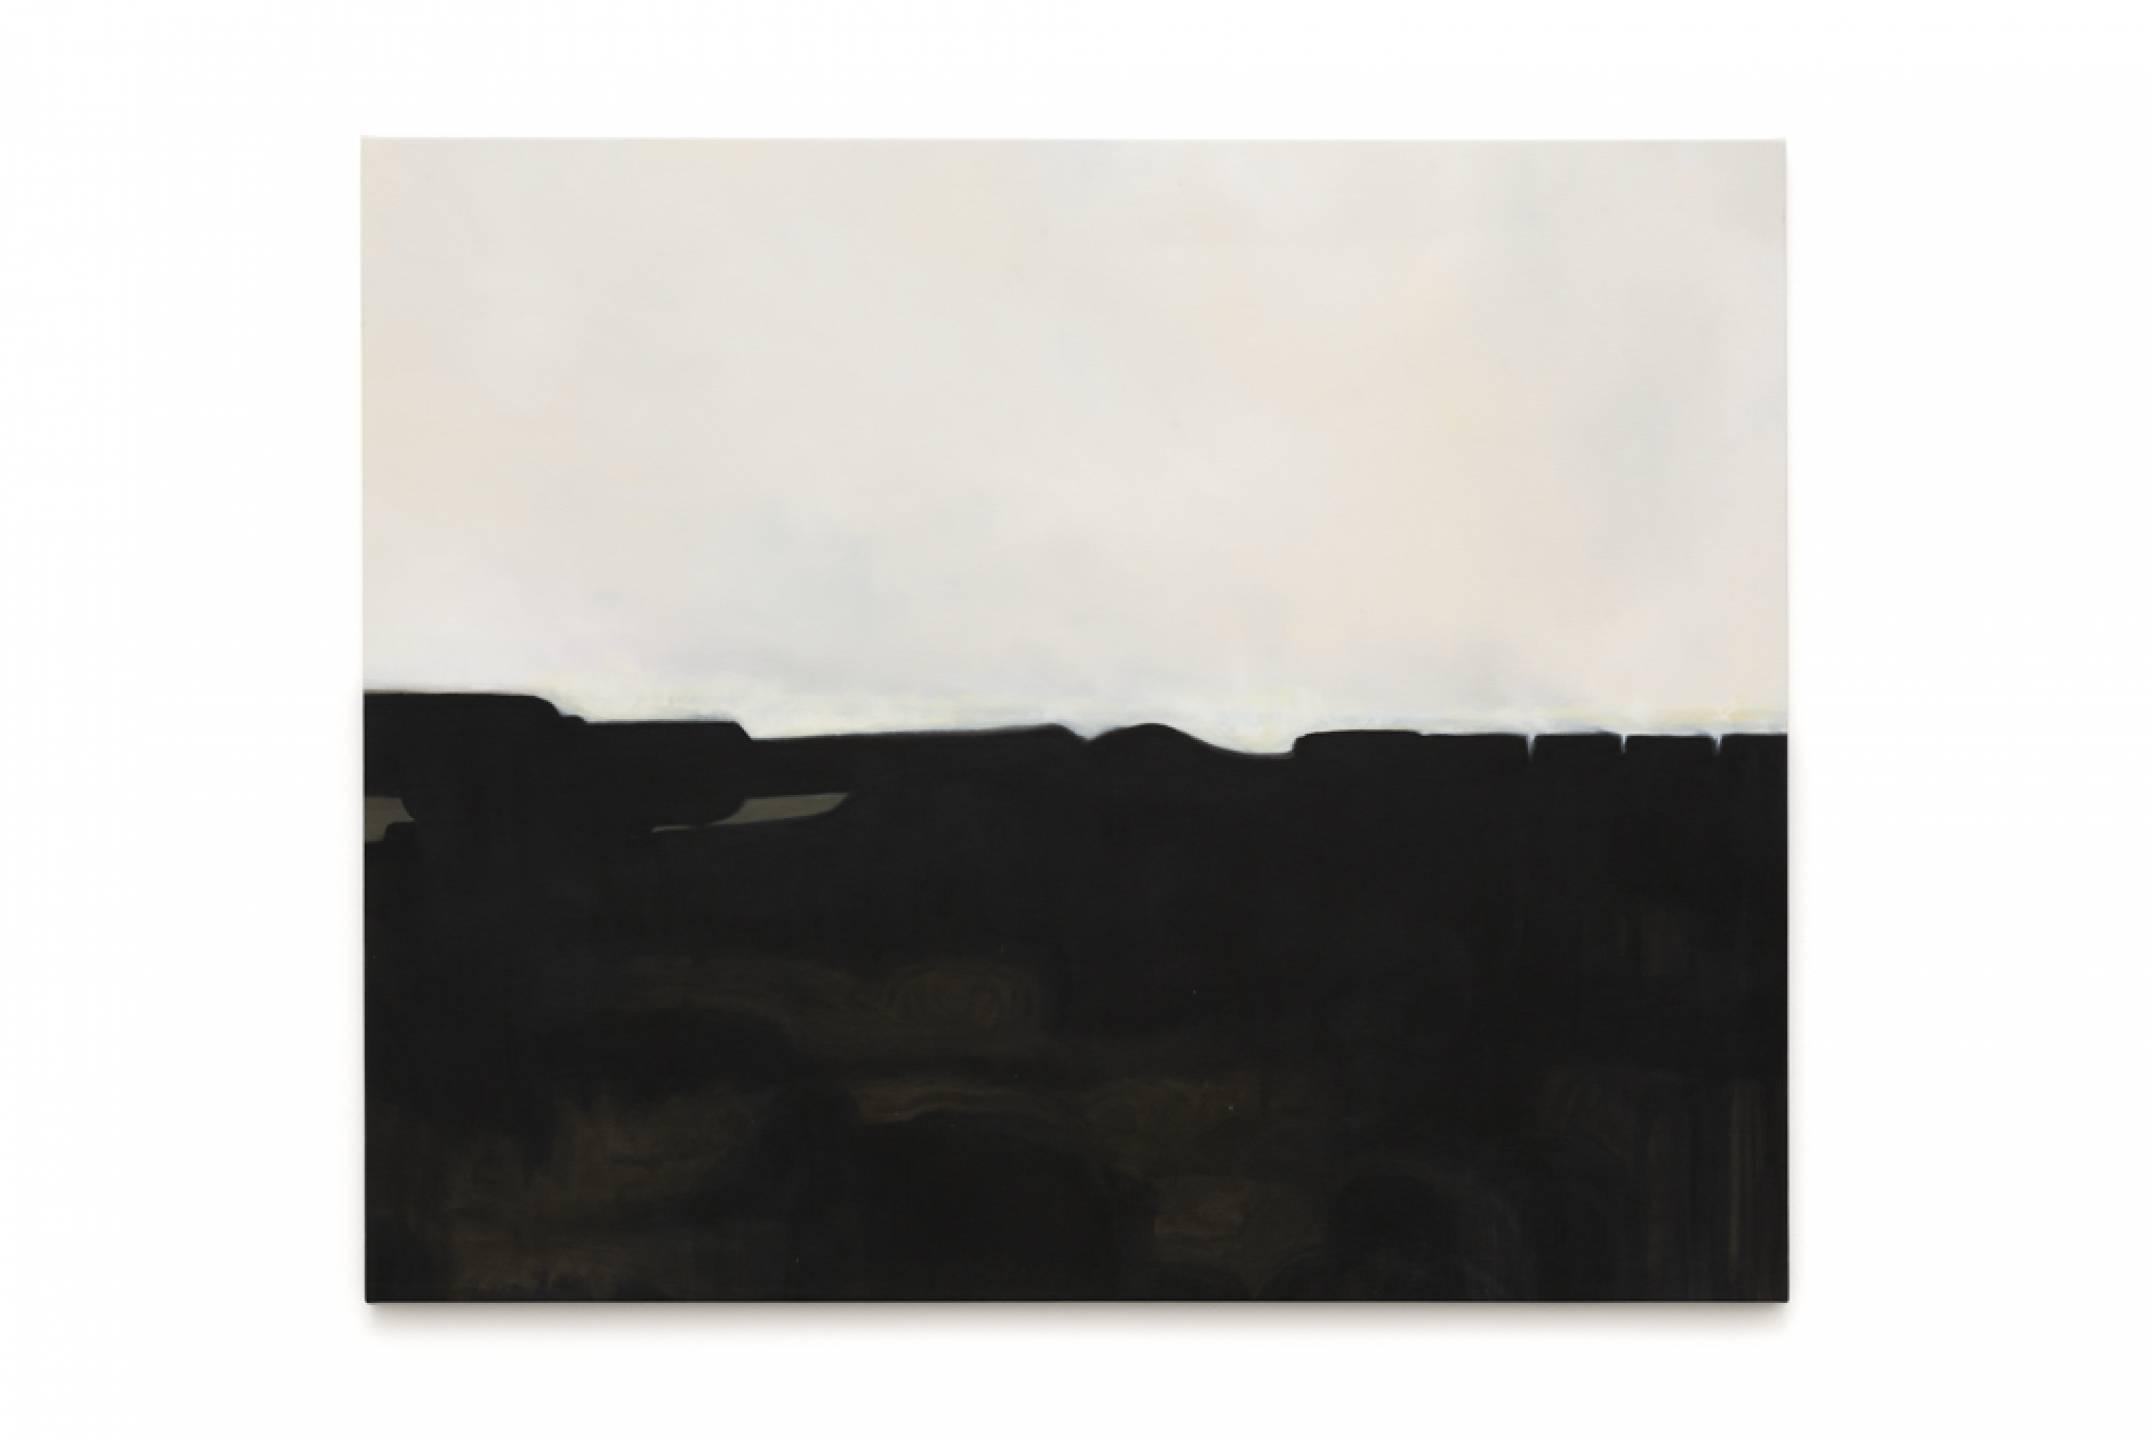 Marina Perez Simão,&nbsp;<em>untitled,</em> 2017,&nbsp;oil on canvas, 122 × 155 cm - Mendes Wood DM